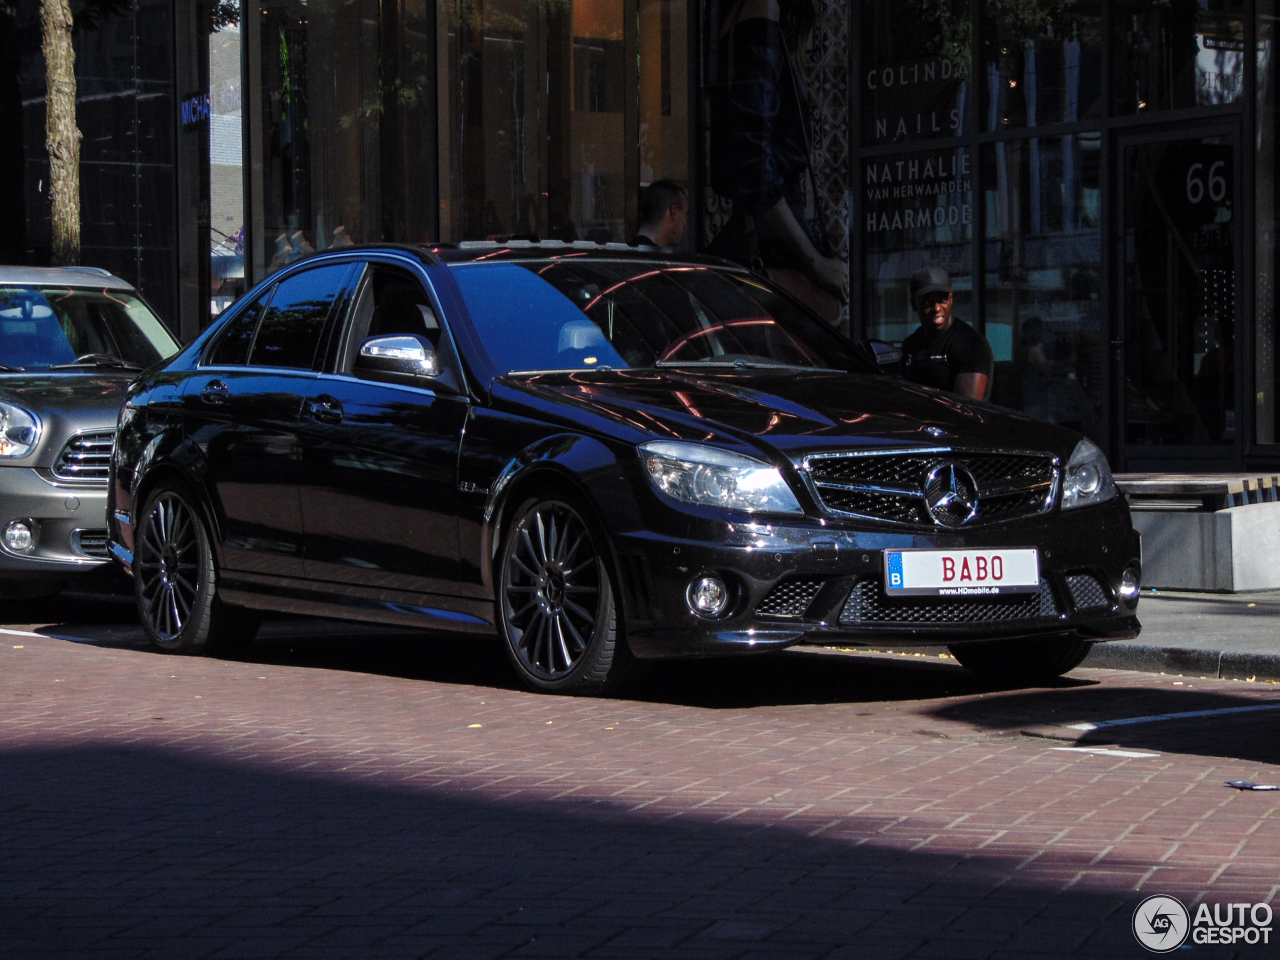 Mercedes Benz C 63 AMG W204 20 Juli 2016 Autogespot